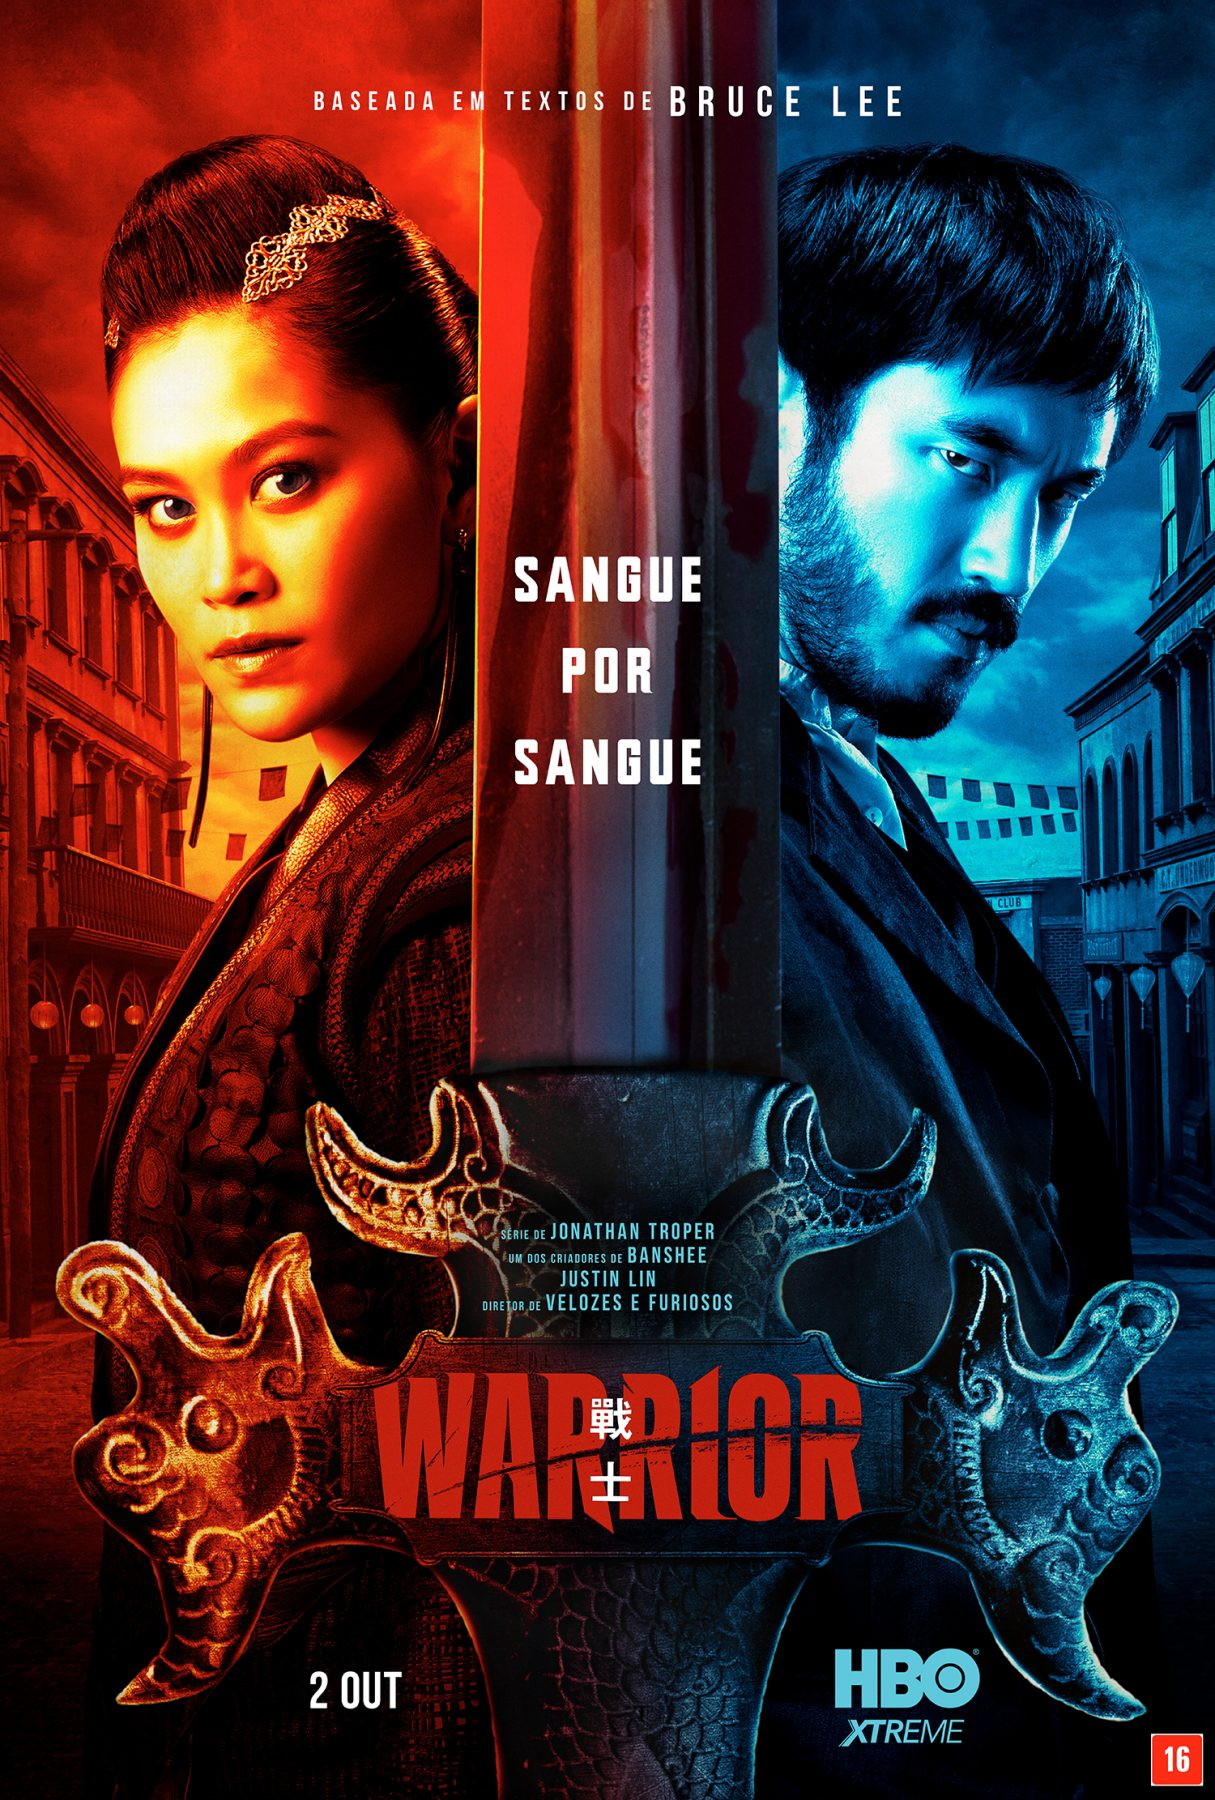 HBO divulga pôster oficial da segunda temporada de Warrior